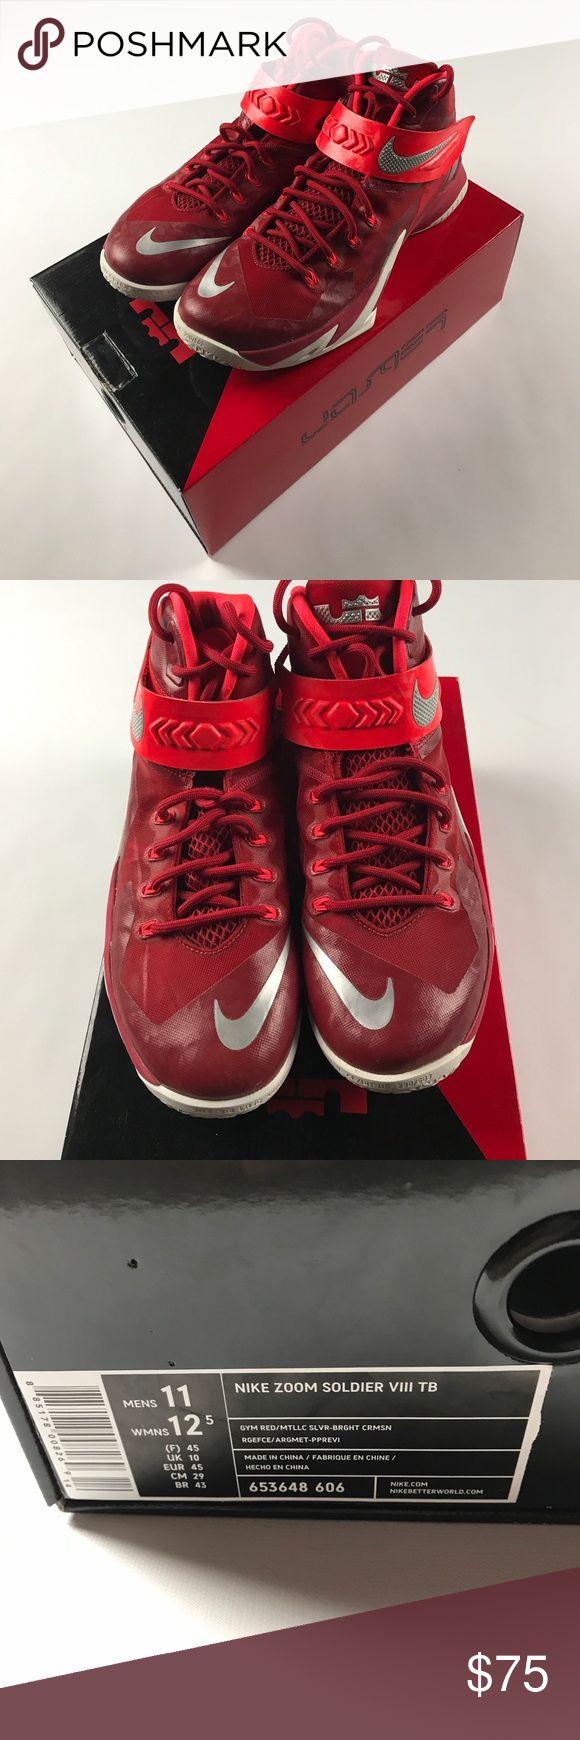 c517d590ba96a The 25+ best Lebrons shoes ideas on Pinterest Nike ...